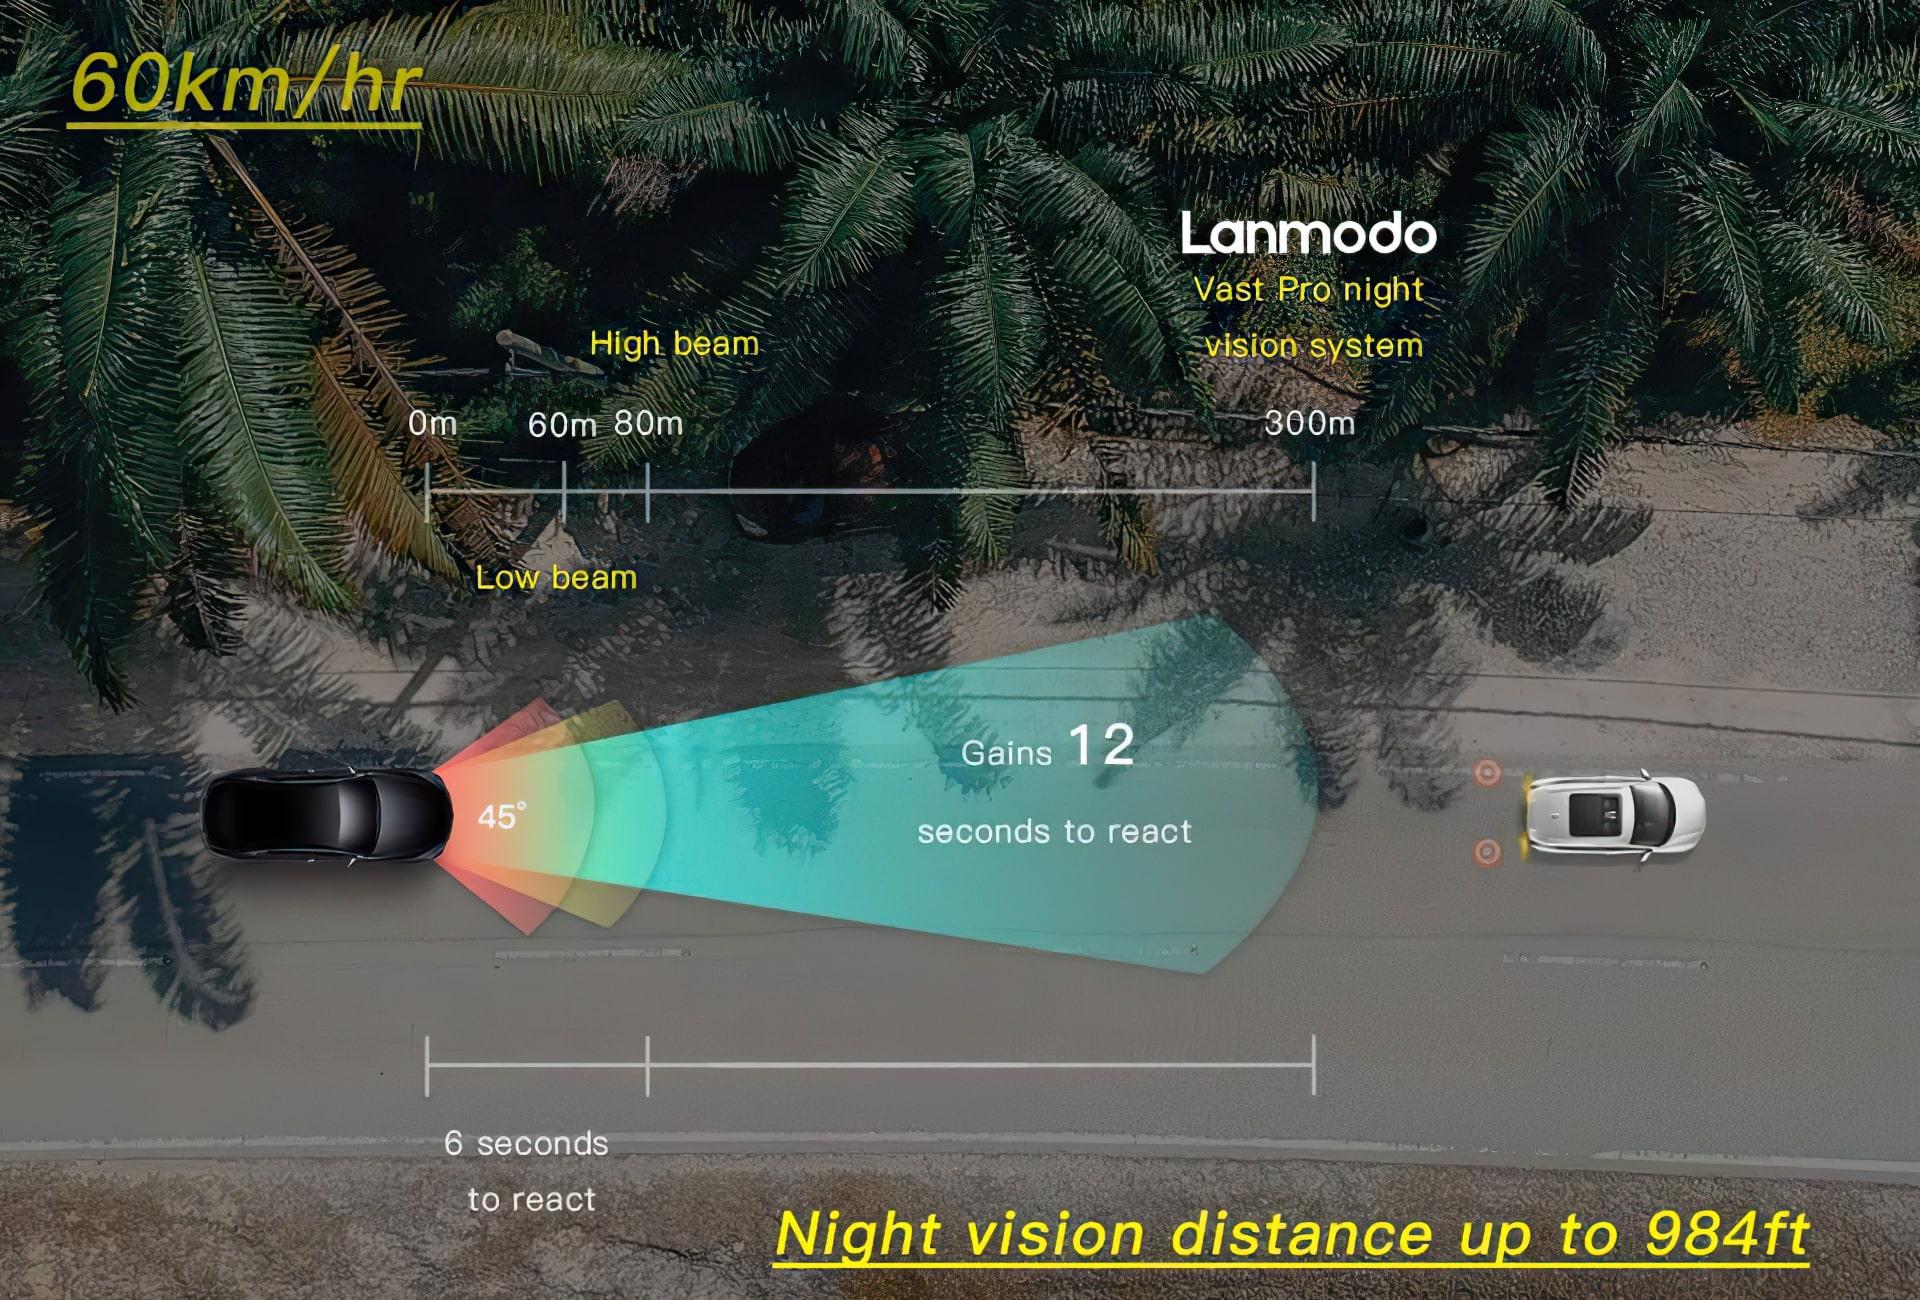 Lanmodo Vast Pro - Distance of work